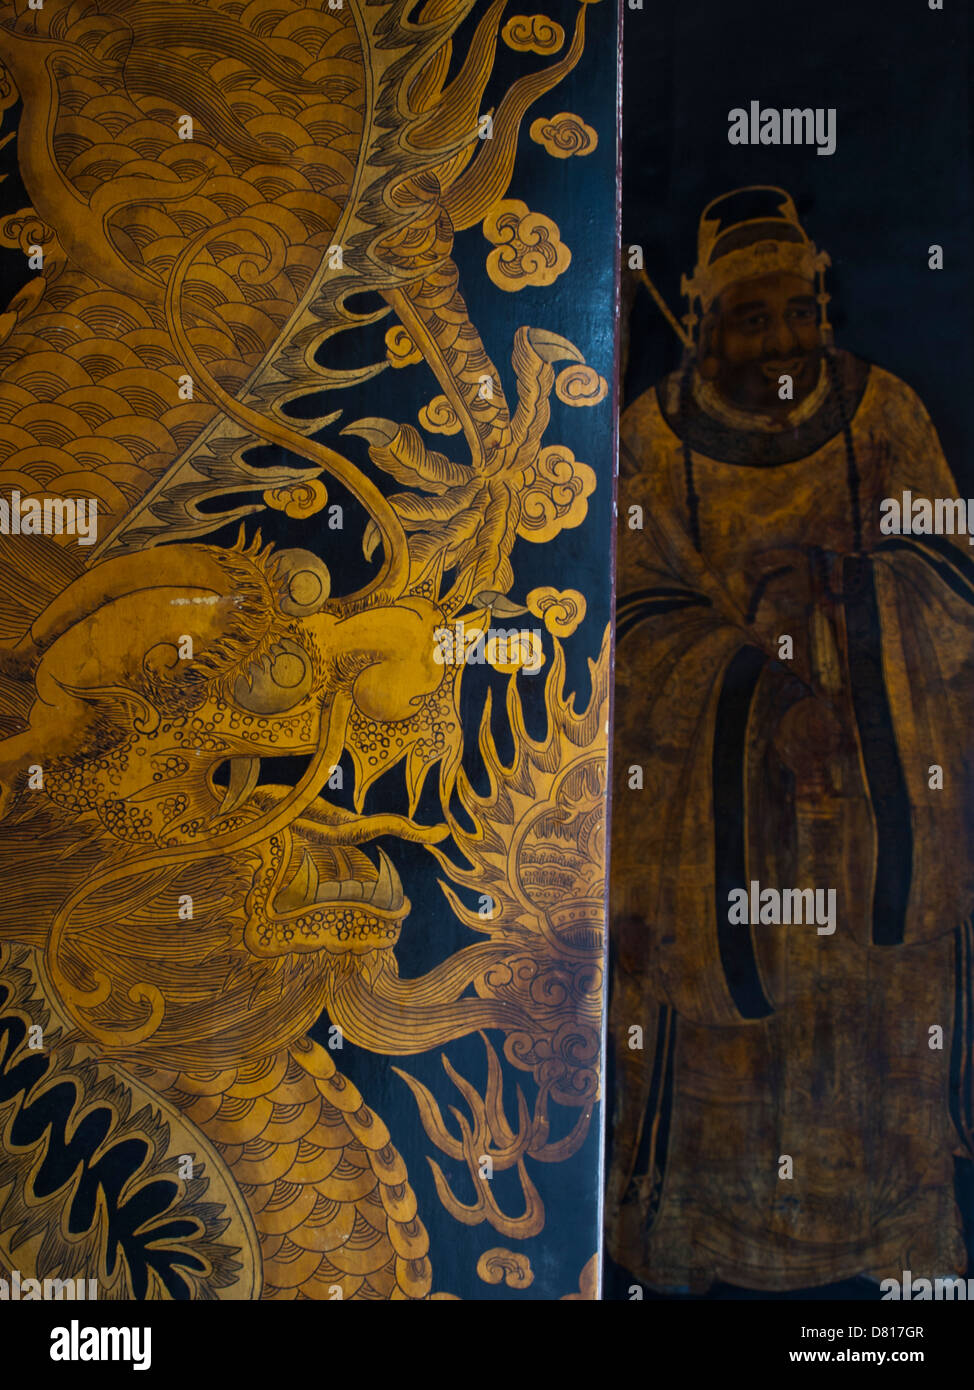 Thian Hock Keng Temple golden dragon painting on door - Stock Image